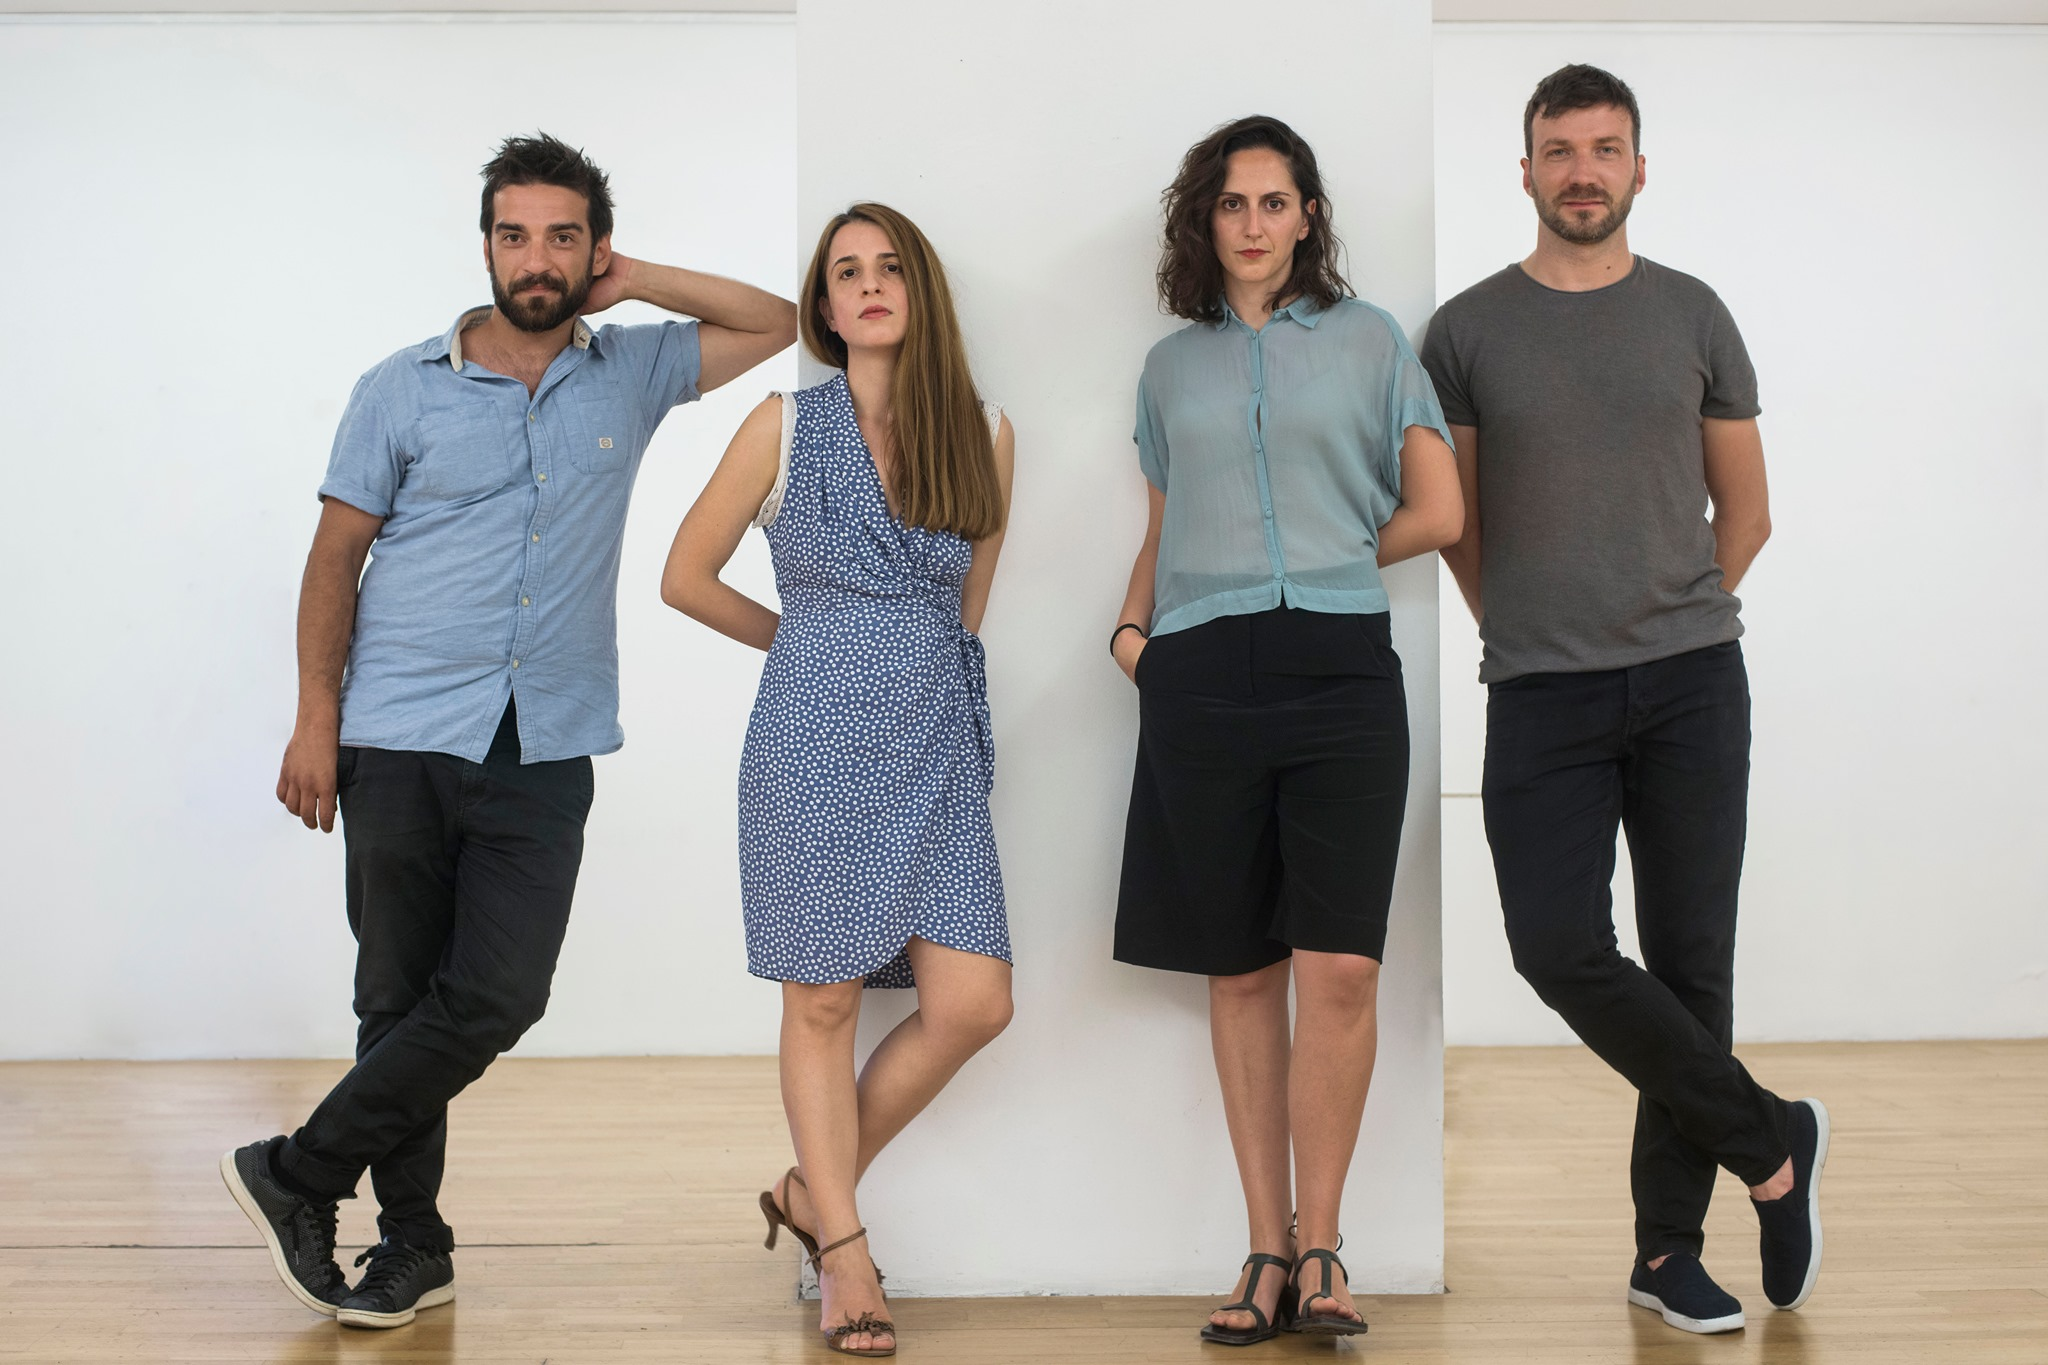 ARDHJE Award 2019 finalists